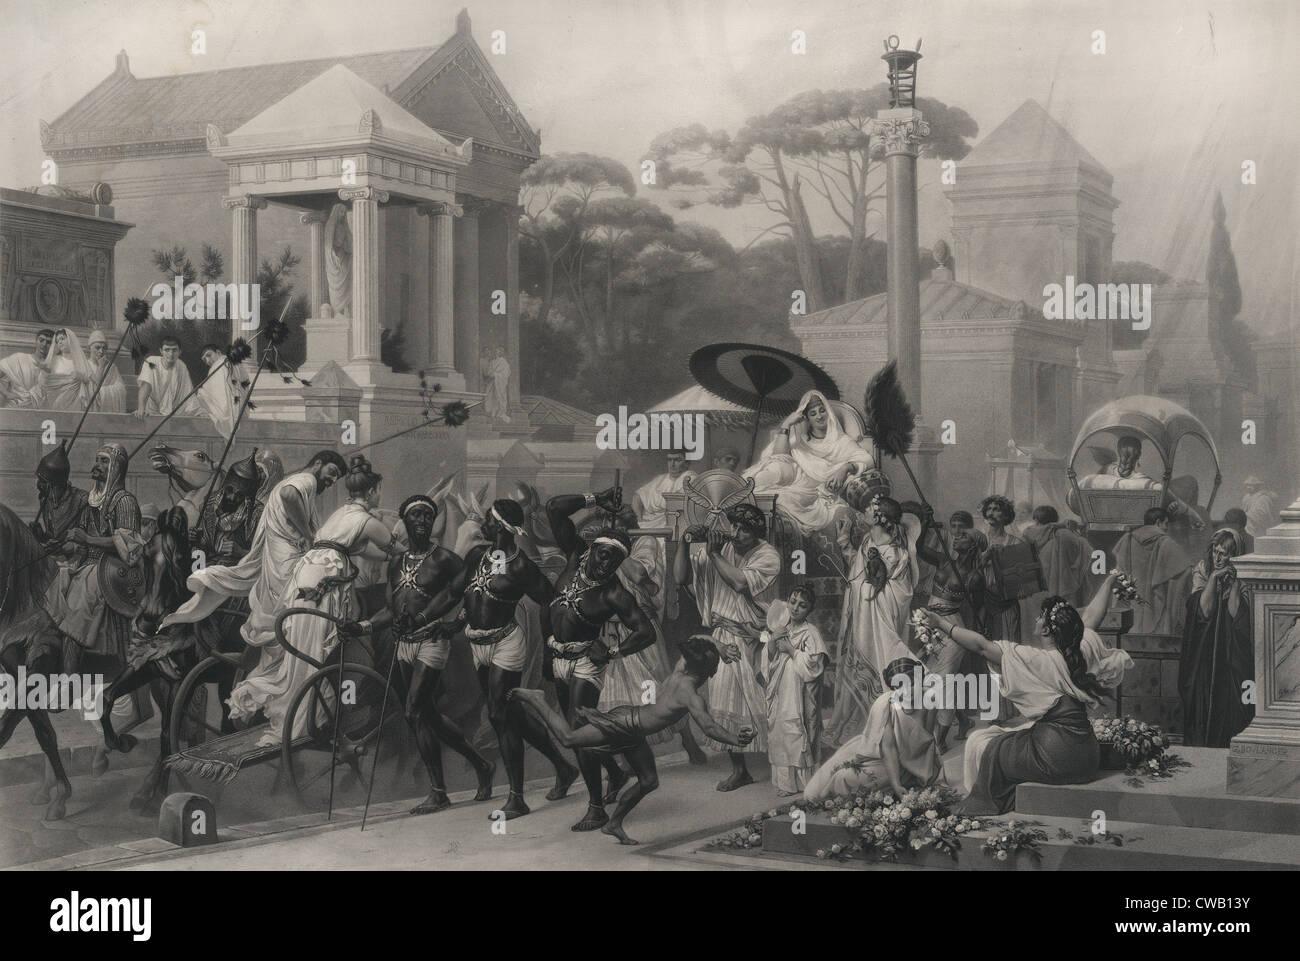 Antike Rom, die Via Appia Via Appia, Italien, Kupferstich um 1880. Stockbild